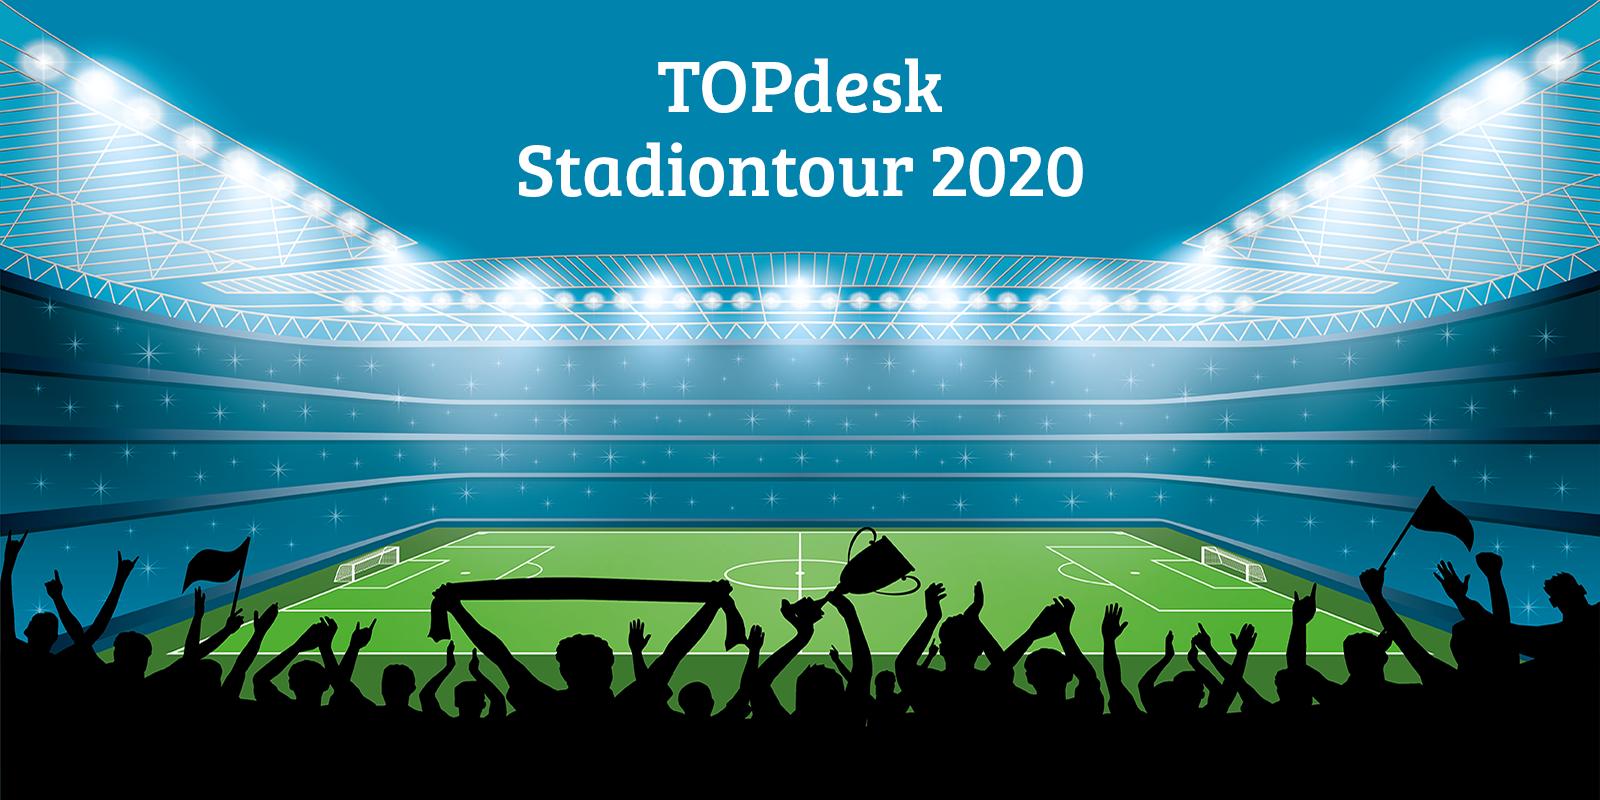 TOPdesk Stadiontour